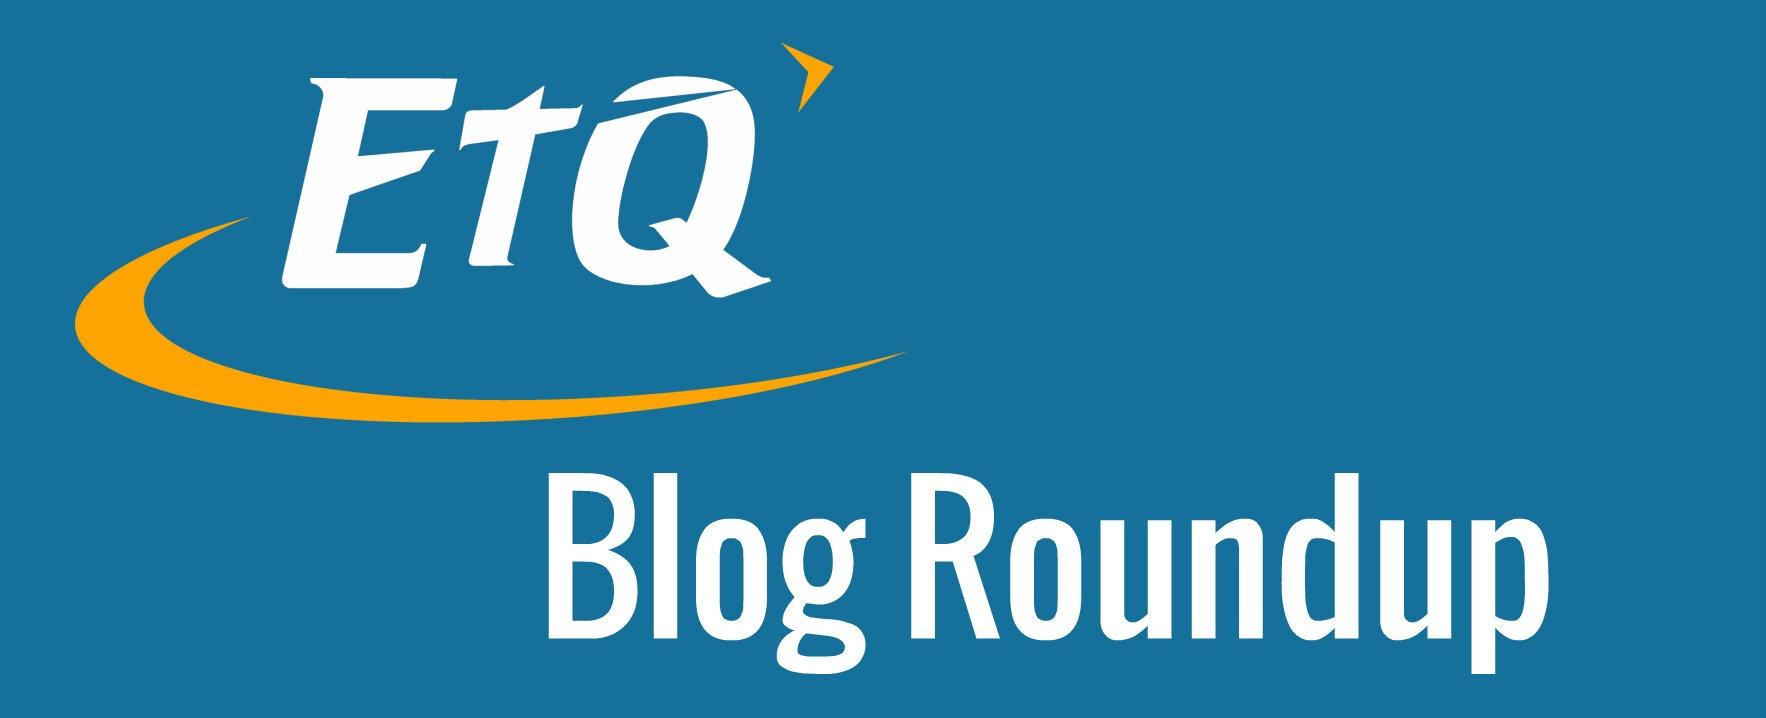 Blog_Roundup.jpg